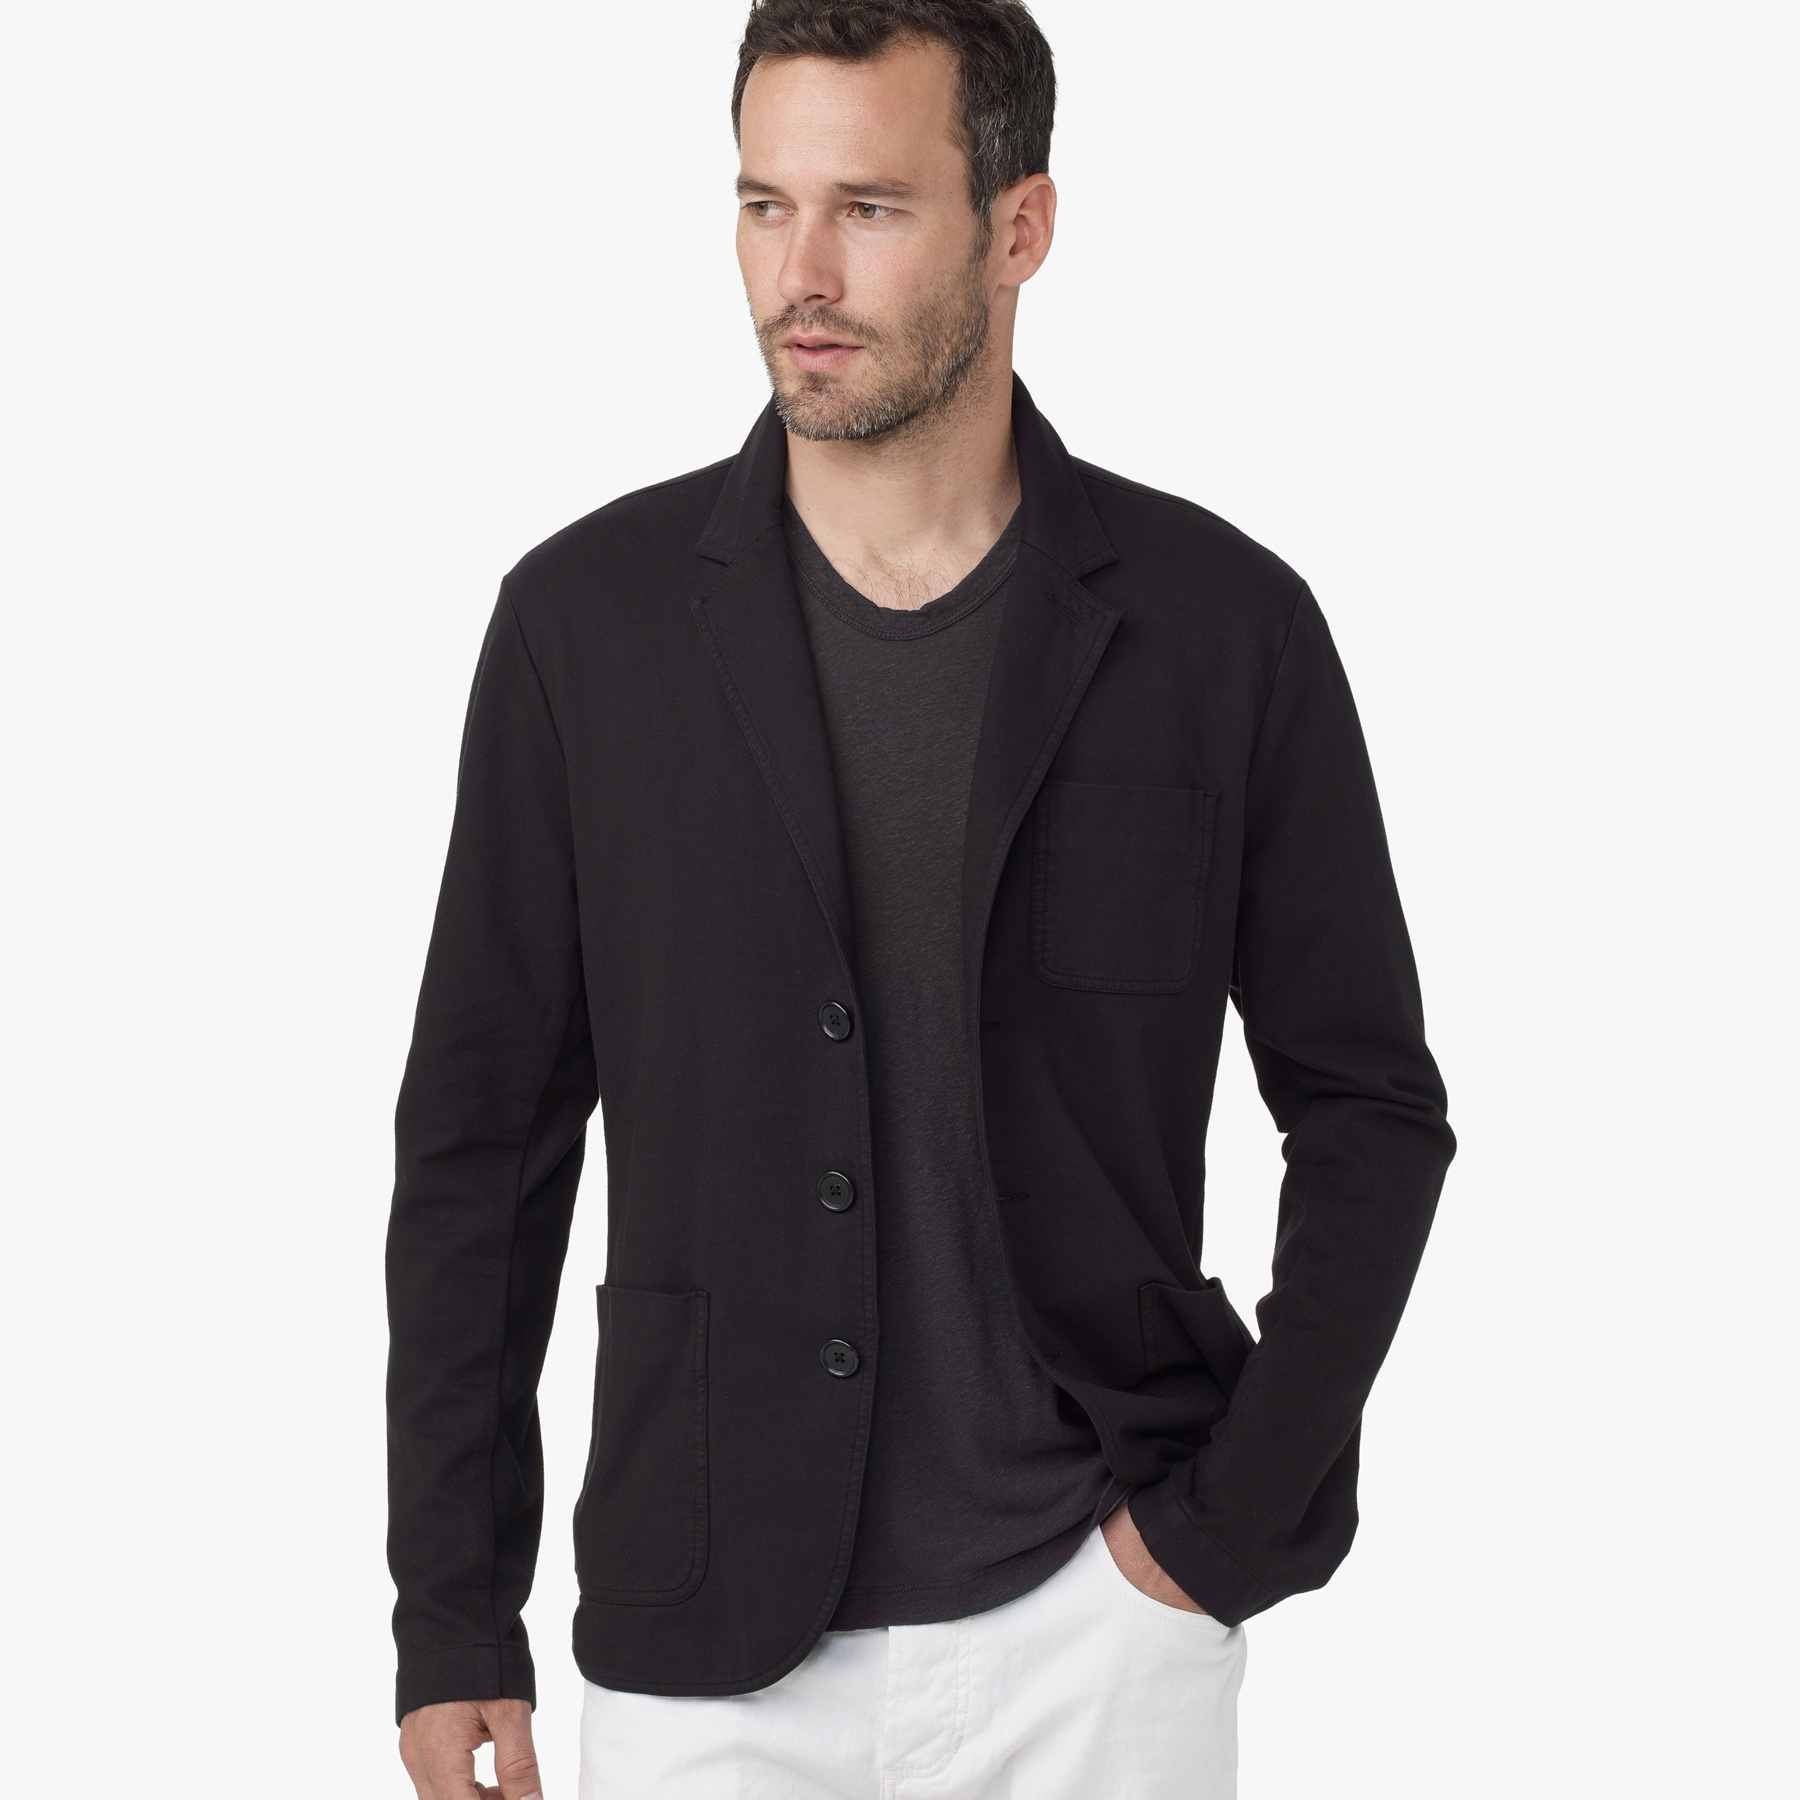 Lyst James Perse Knit Twill Blazer In Black For Men